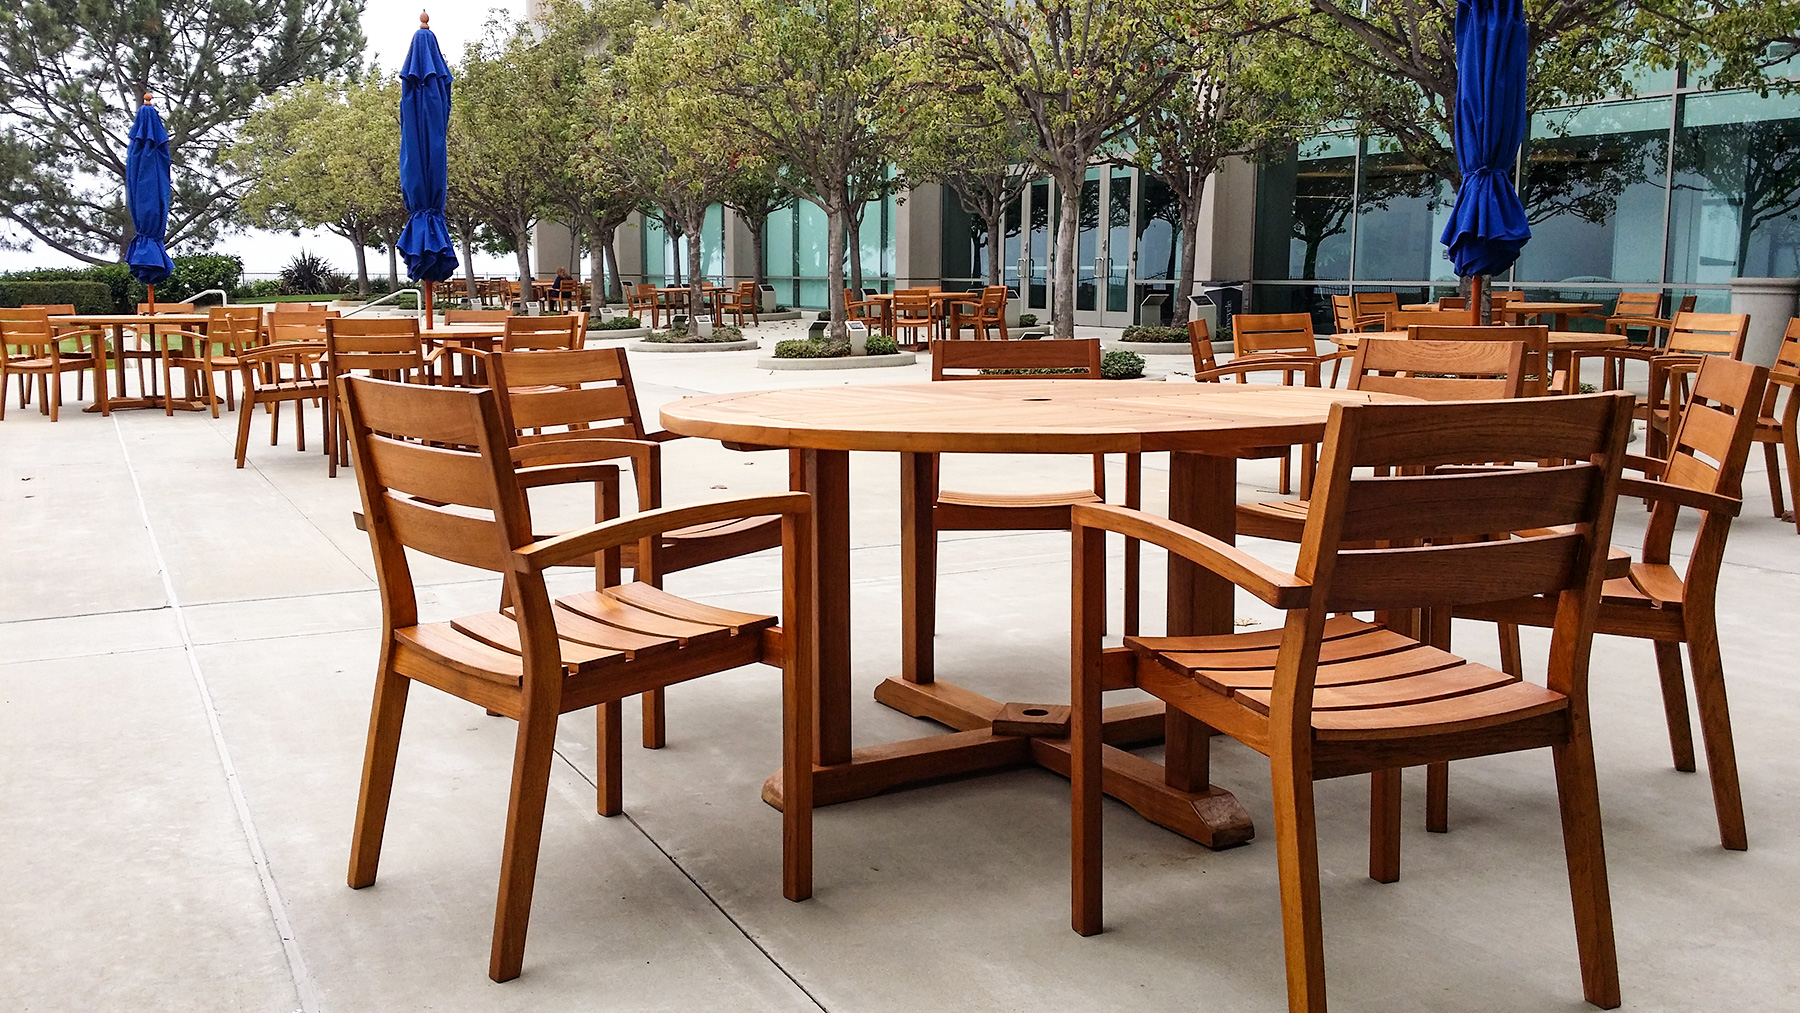 Commercial Patio Furniture Maintenance